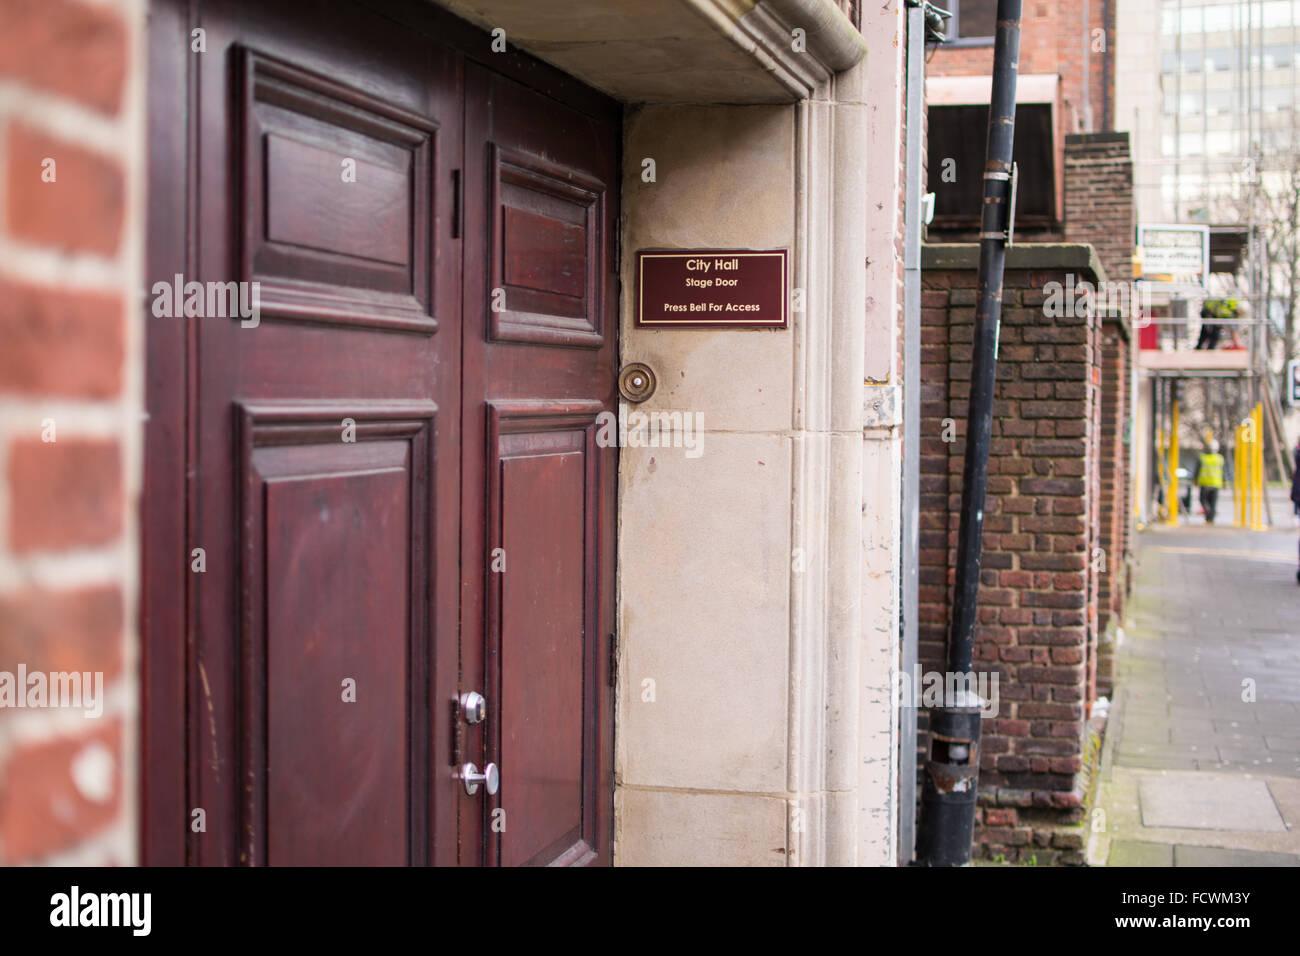 Chubby brown newcastle city hall — img 11